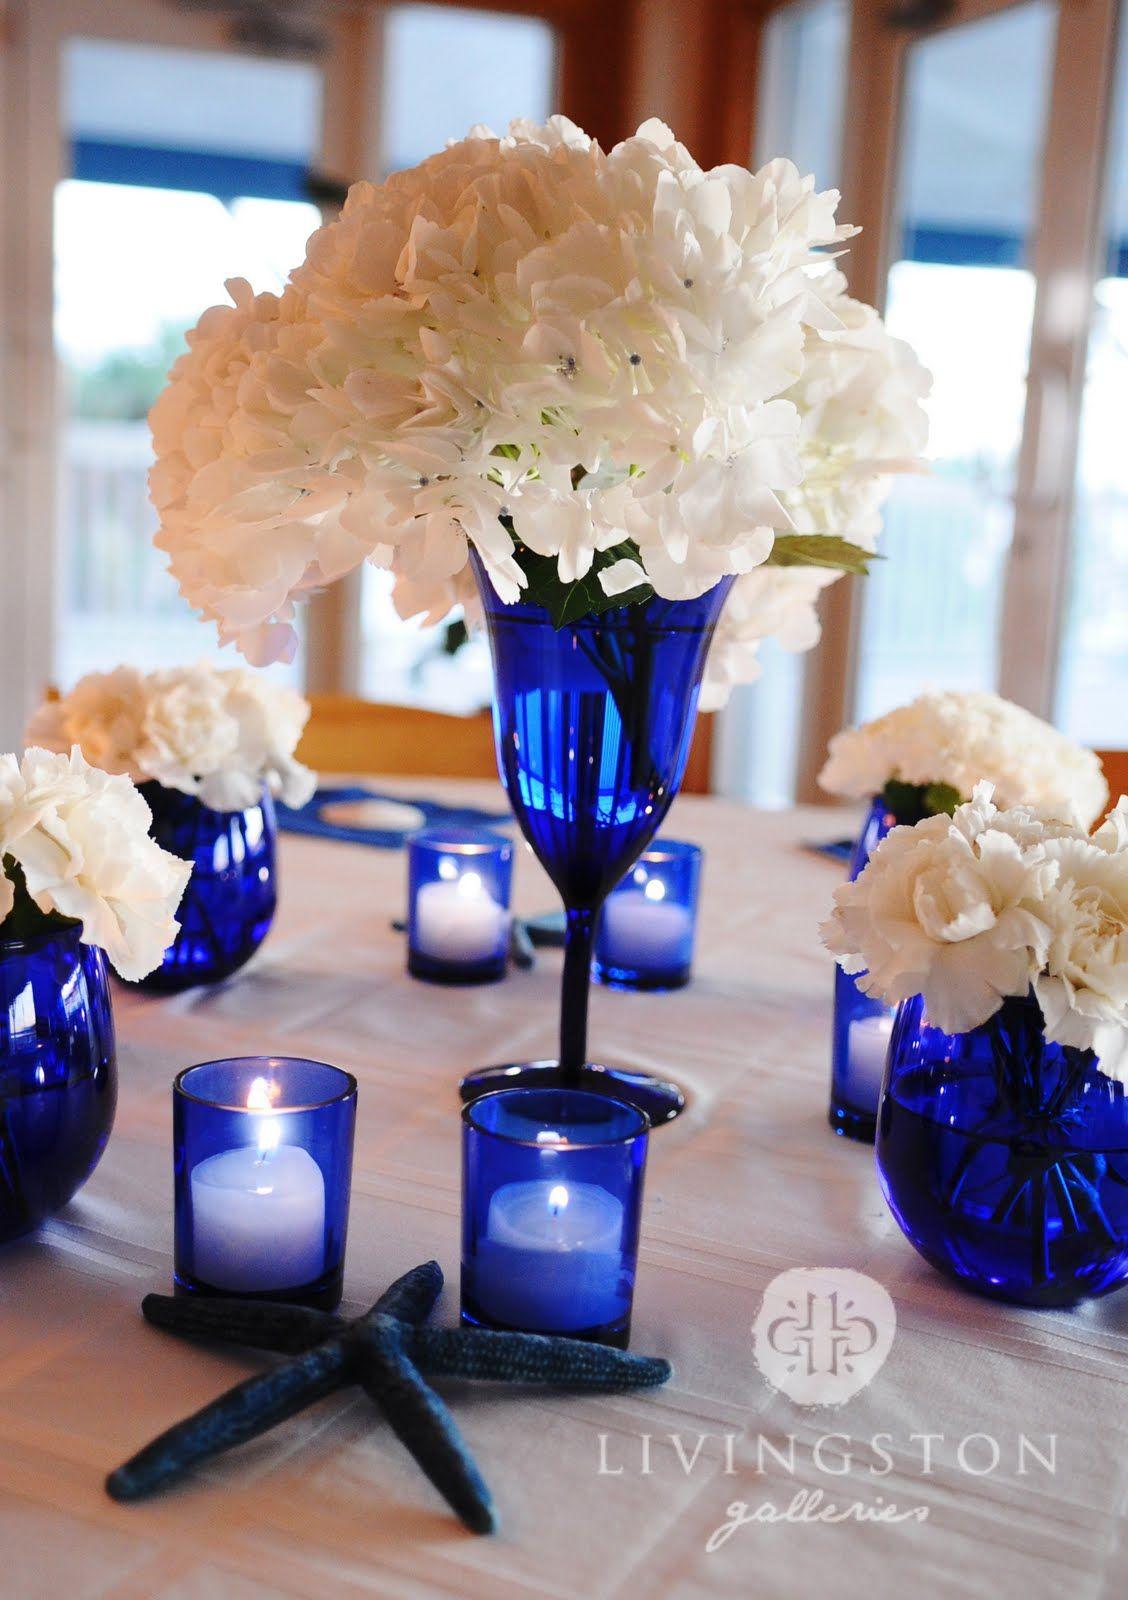 Blue wedding decor ideas  JPG  Mi boda  Pinterest  Wedding Centerpieces and Anniversaries